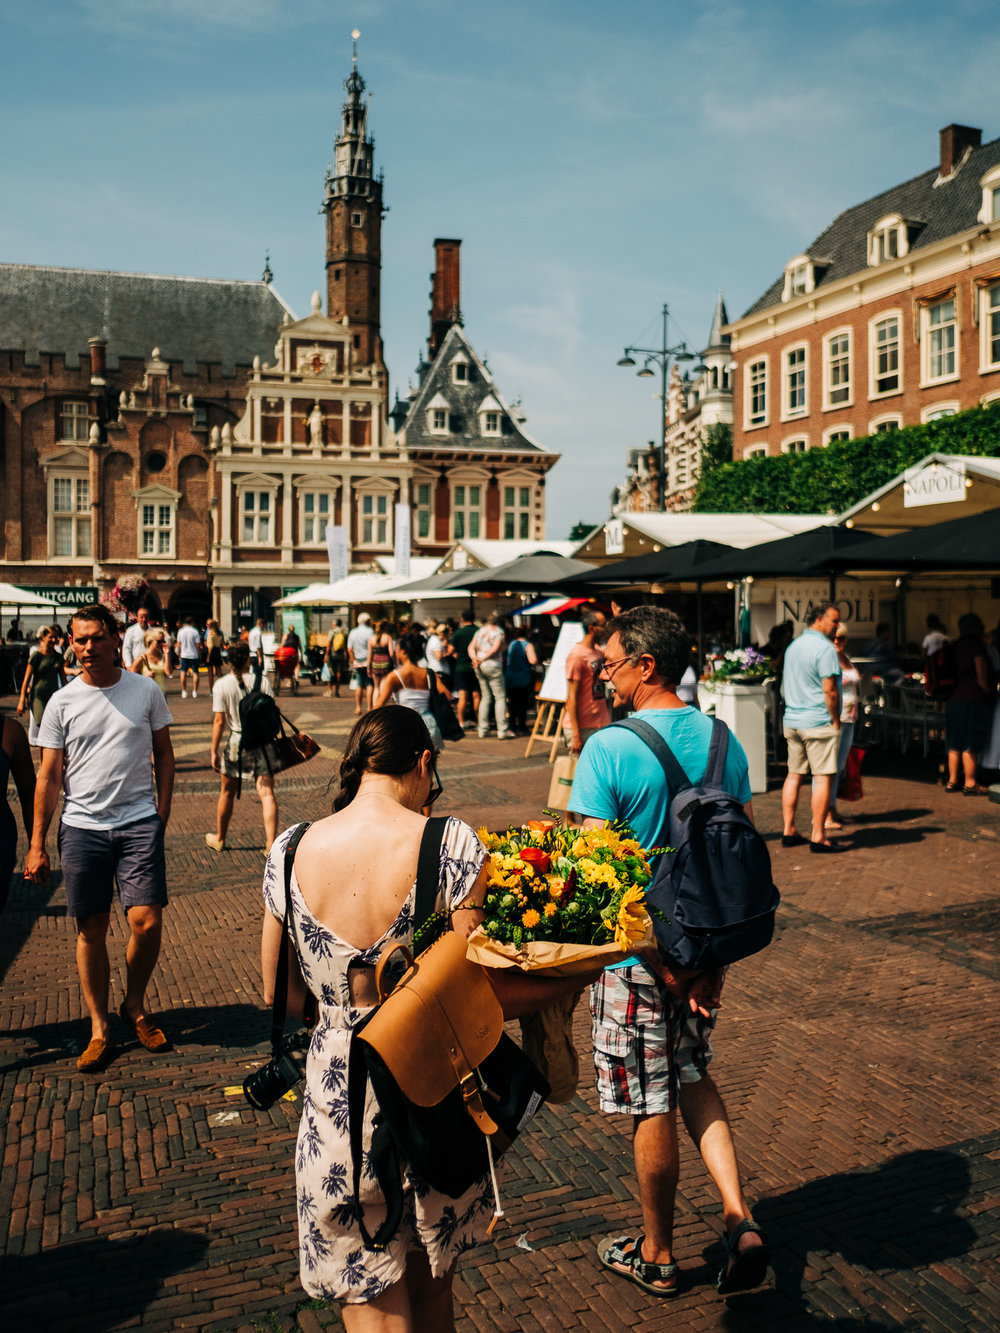 Holland_Urlaub_2018_006.jpg